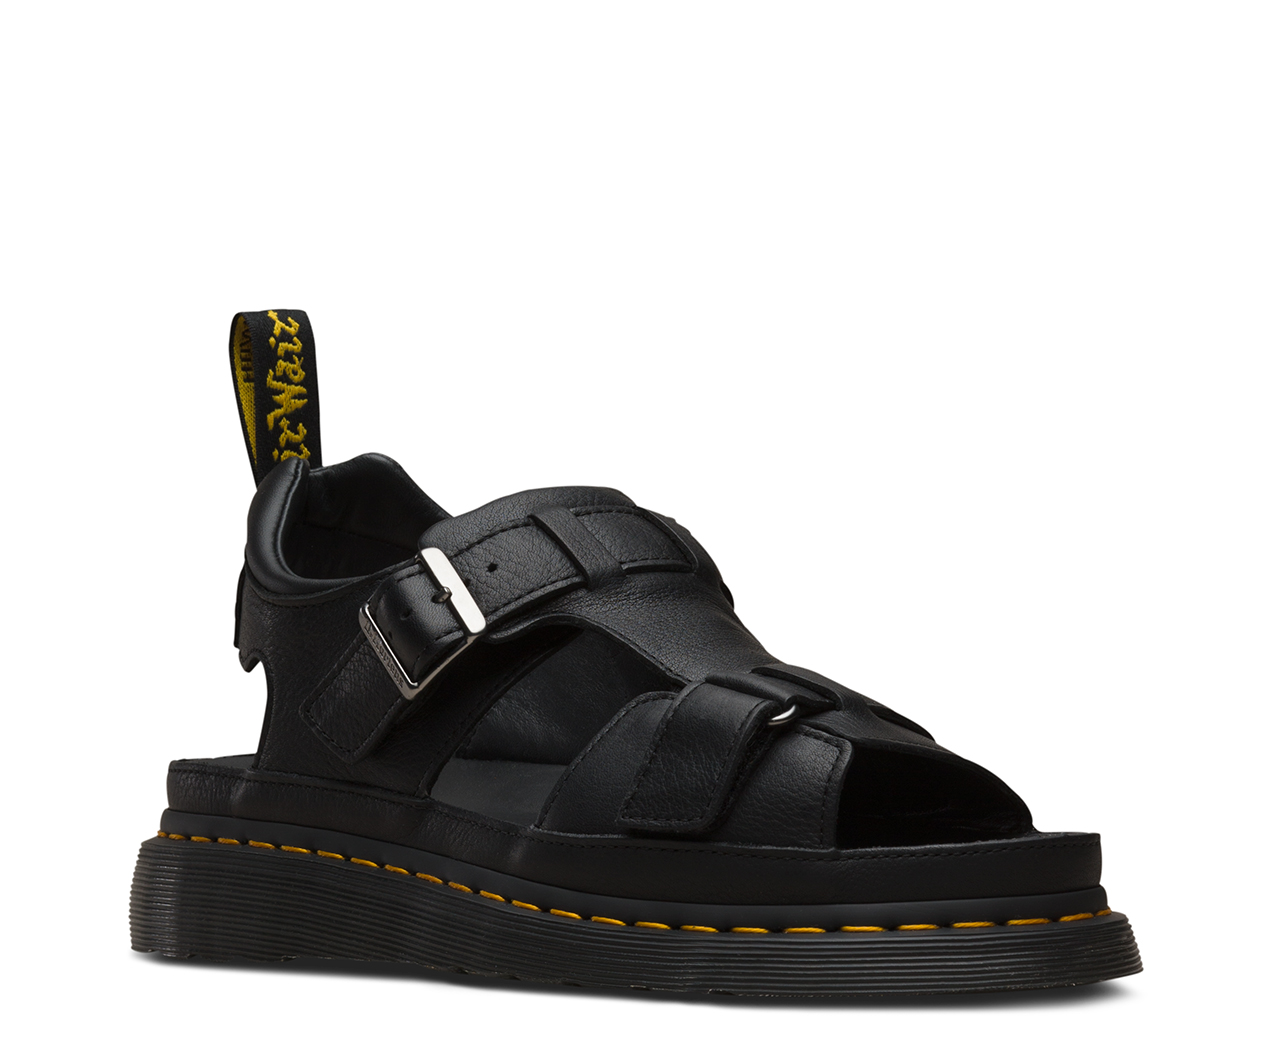 9adb742411480 HAYDEN | Men's Boots, Shoes & Sandals | Dr. Martens Official